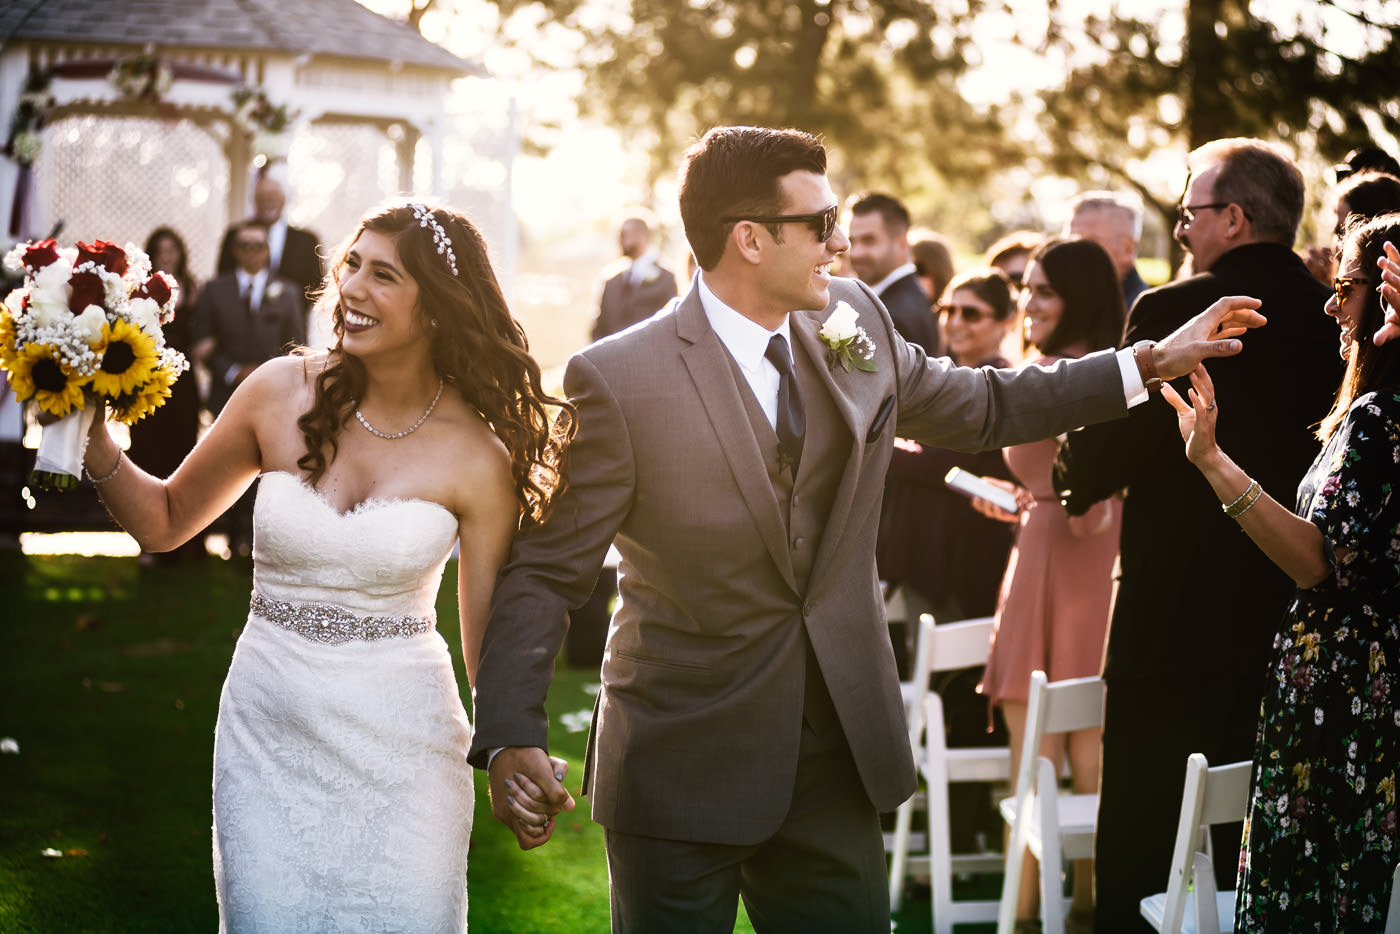 Newlyweds walk down the aisle as husband and wife.